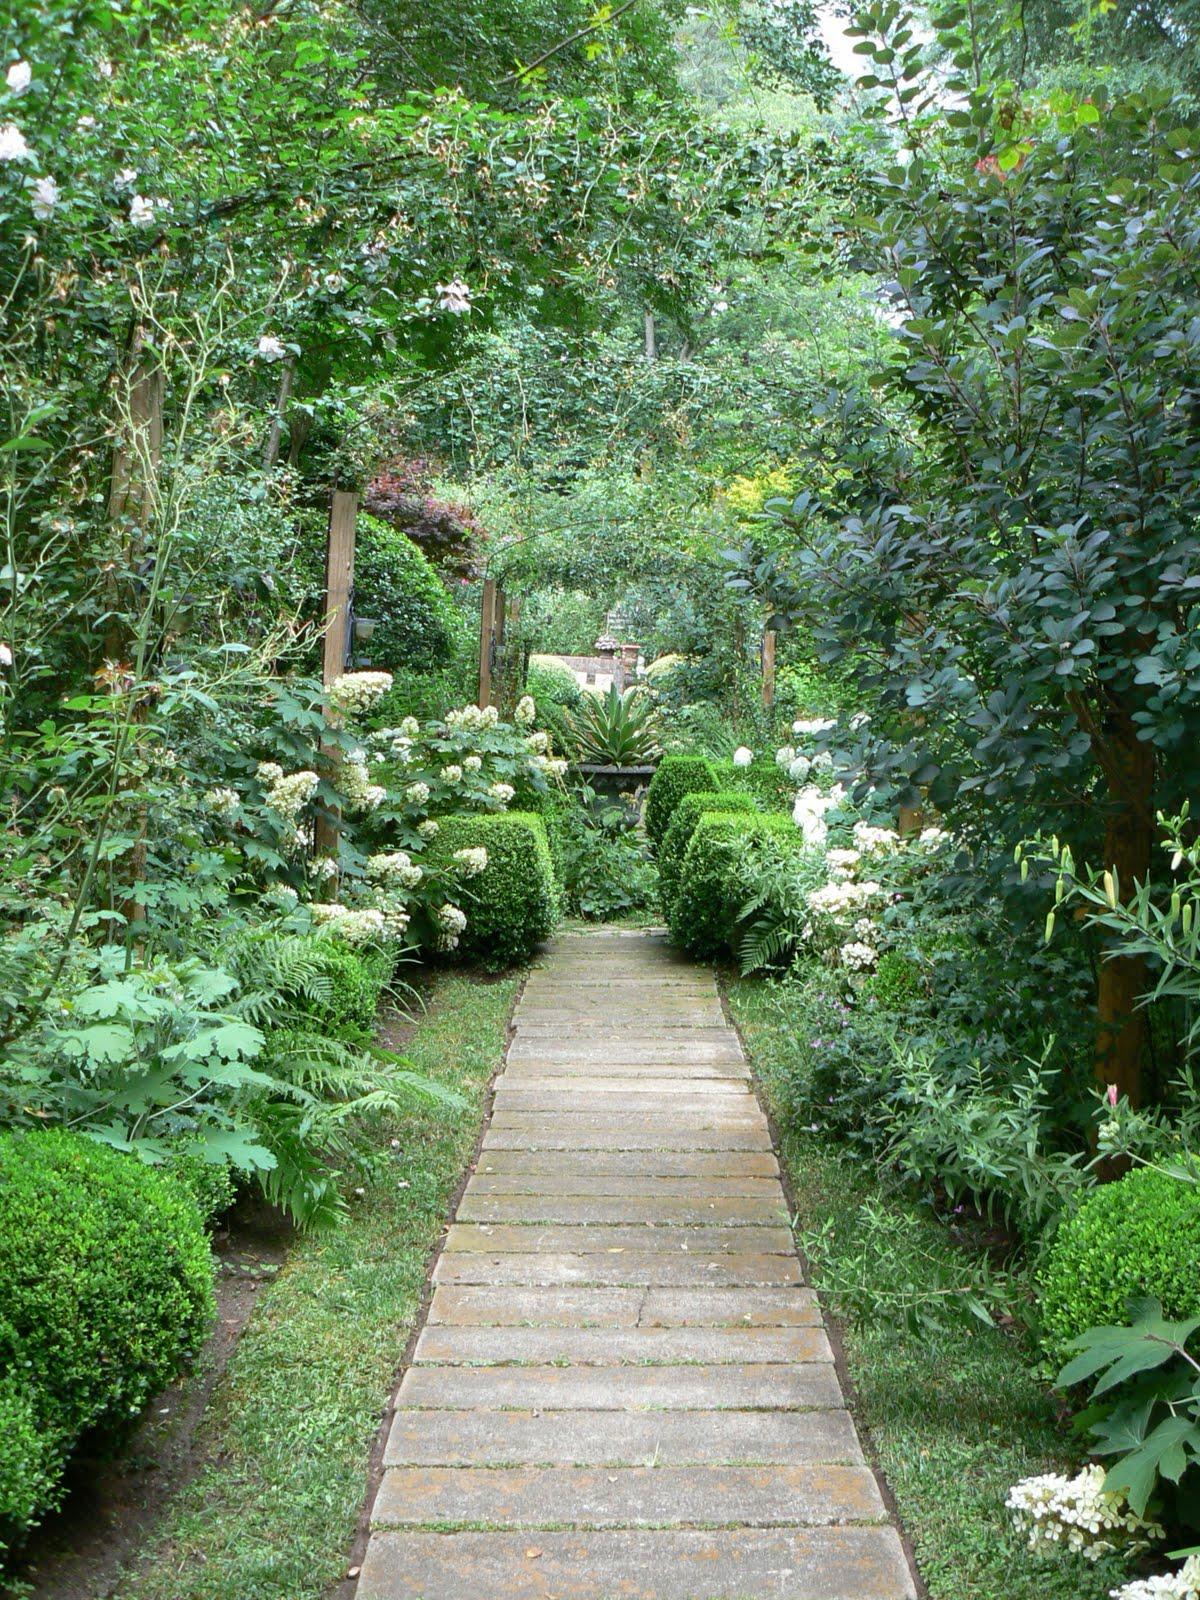 Garden Photo of the Day: Aug 1, 2011